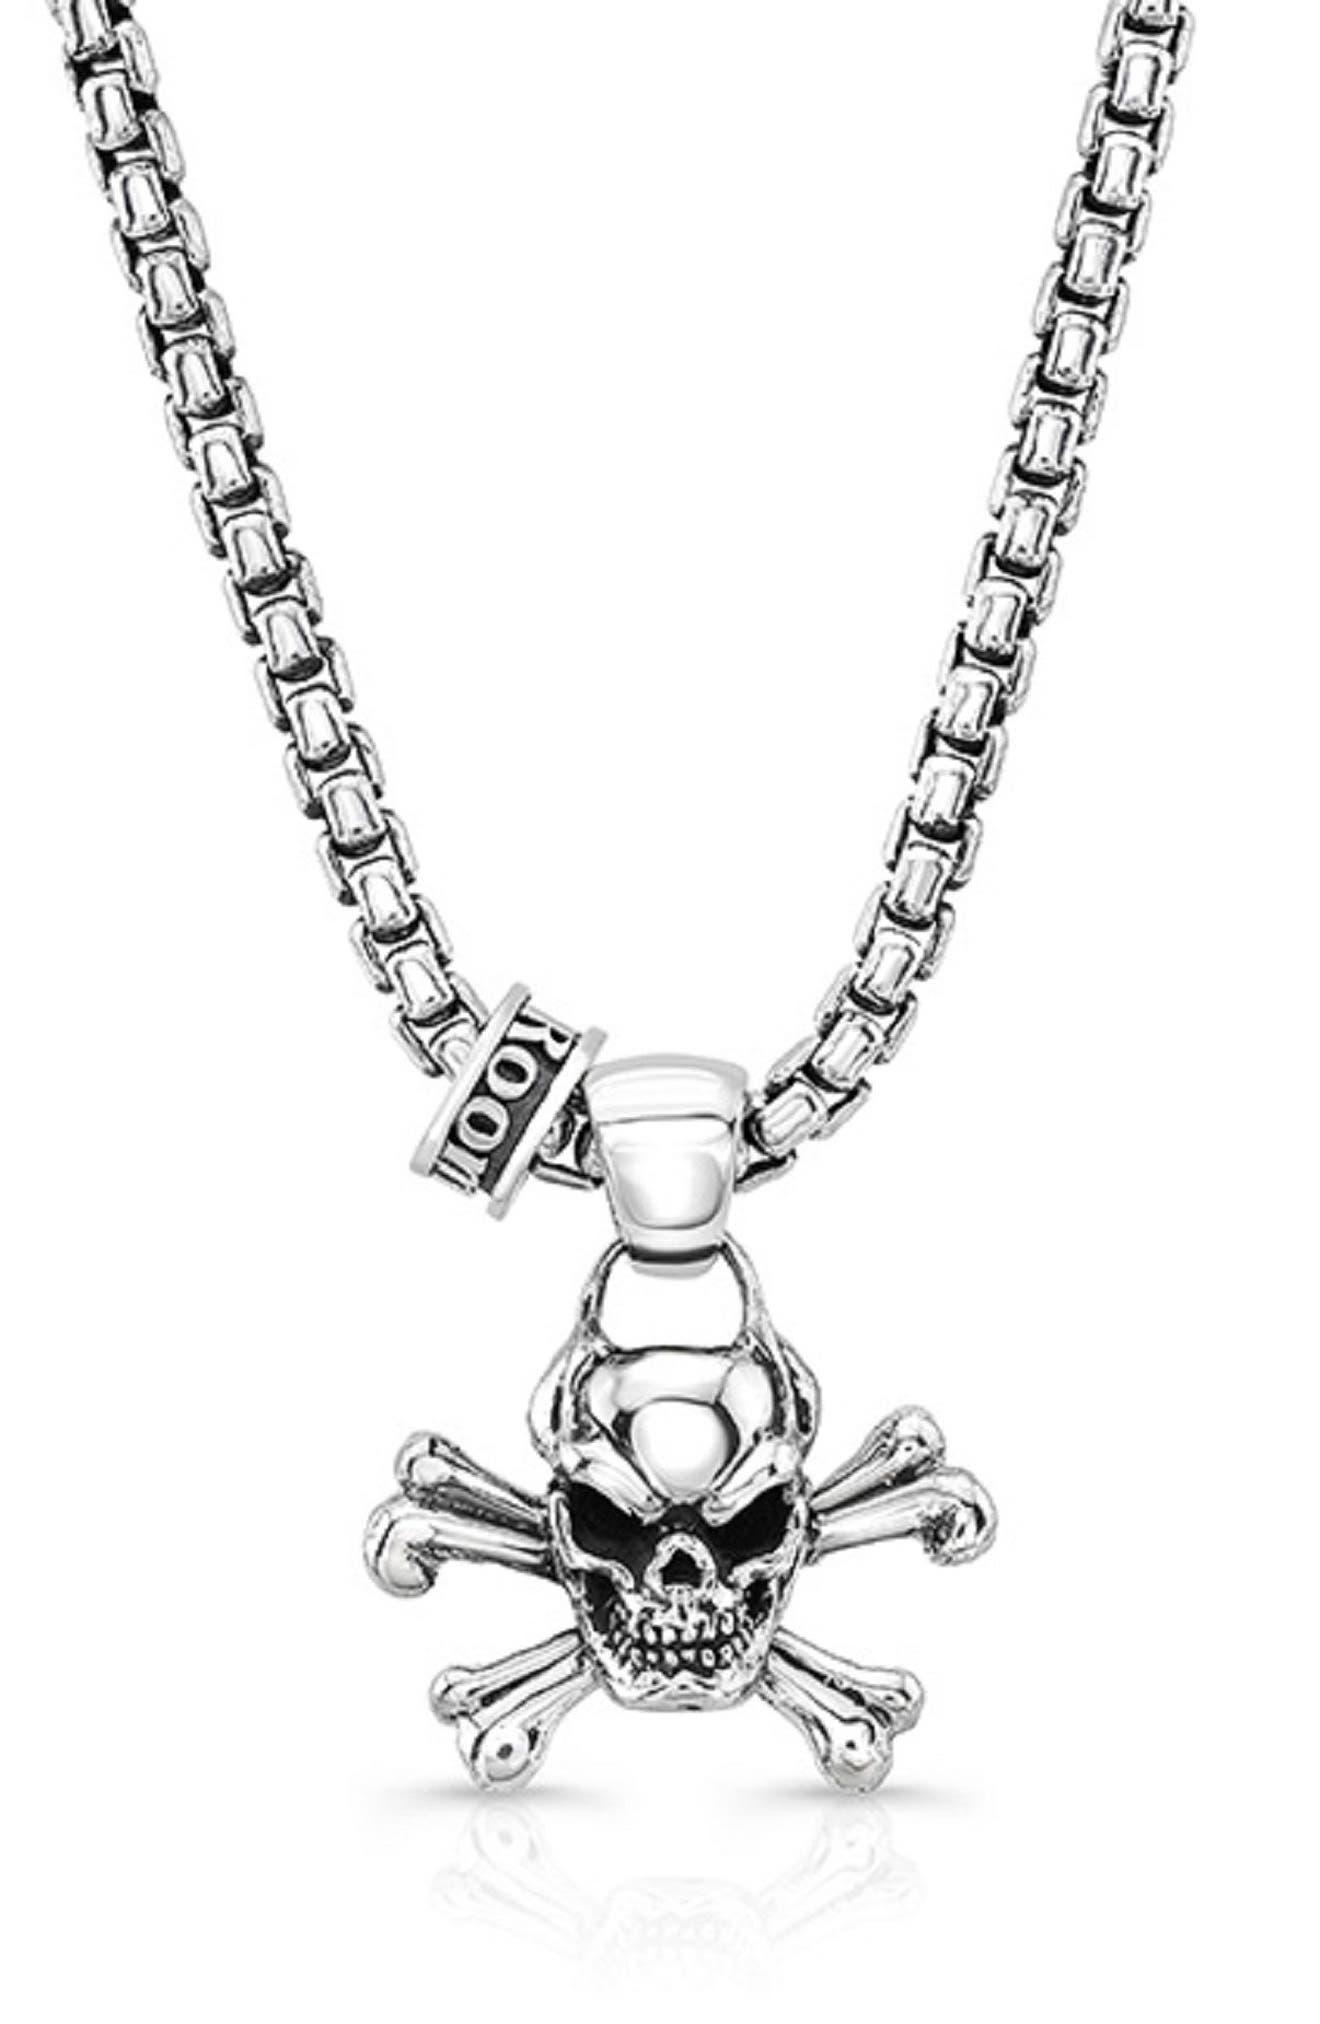 Room101 Skull 'n' Bone Pendant Necklace